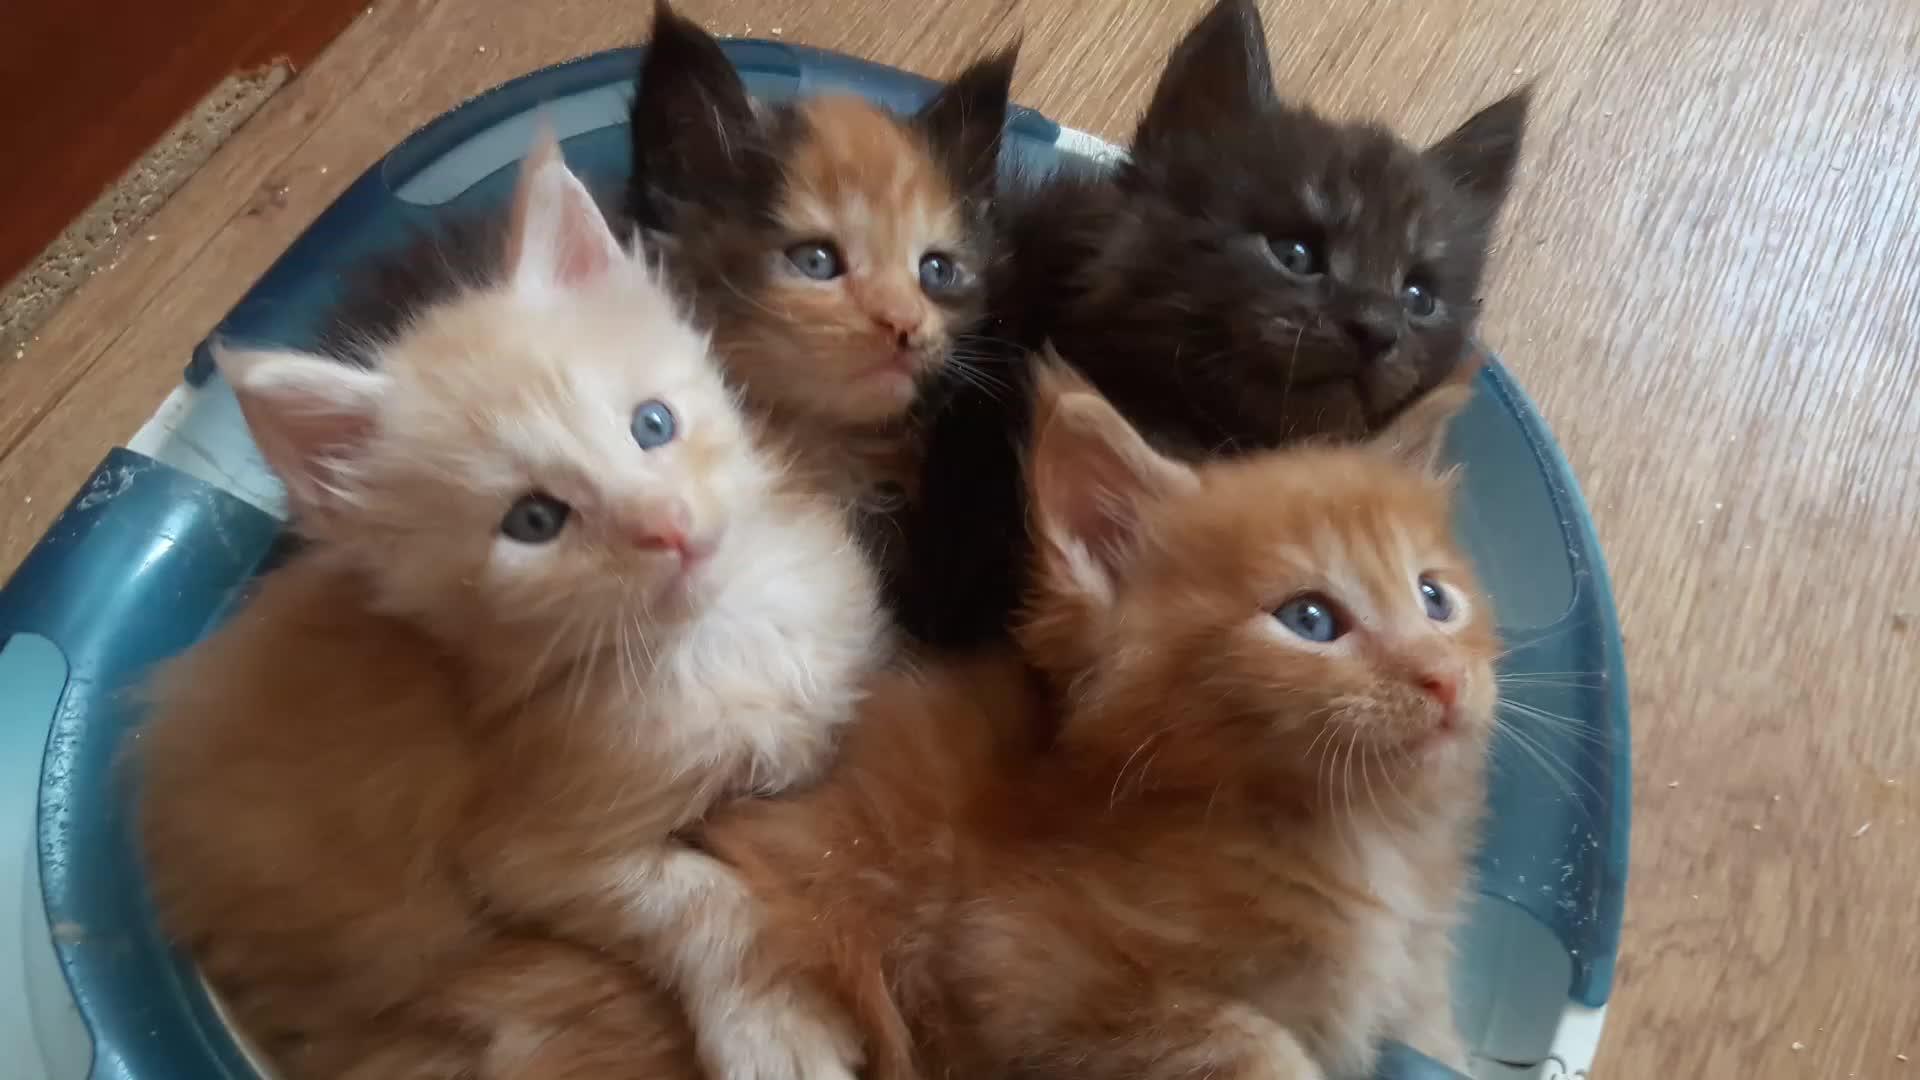 cats, Cute kittens Maine Coon GIFs